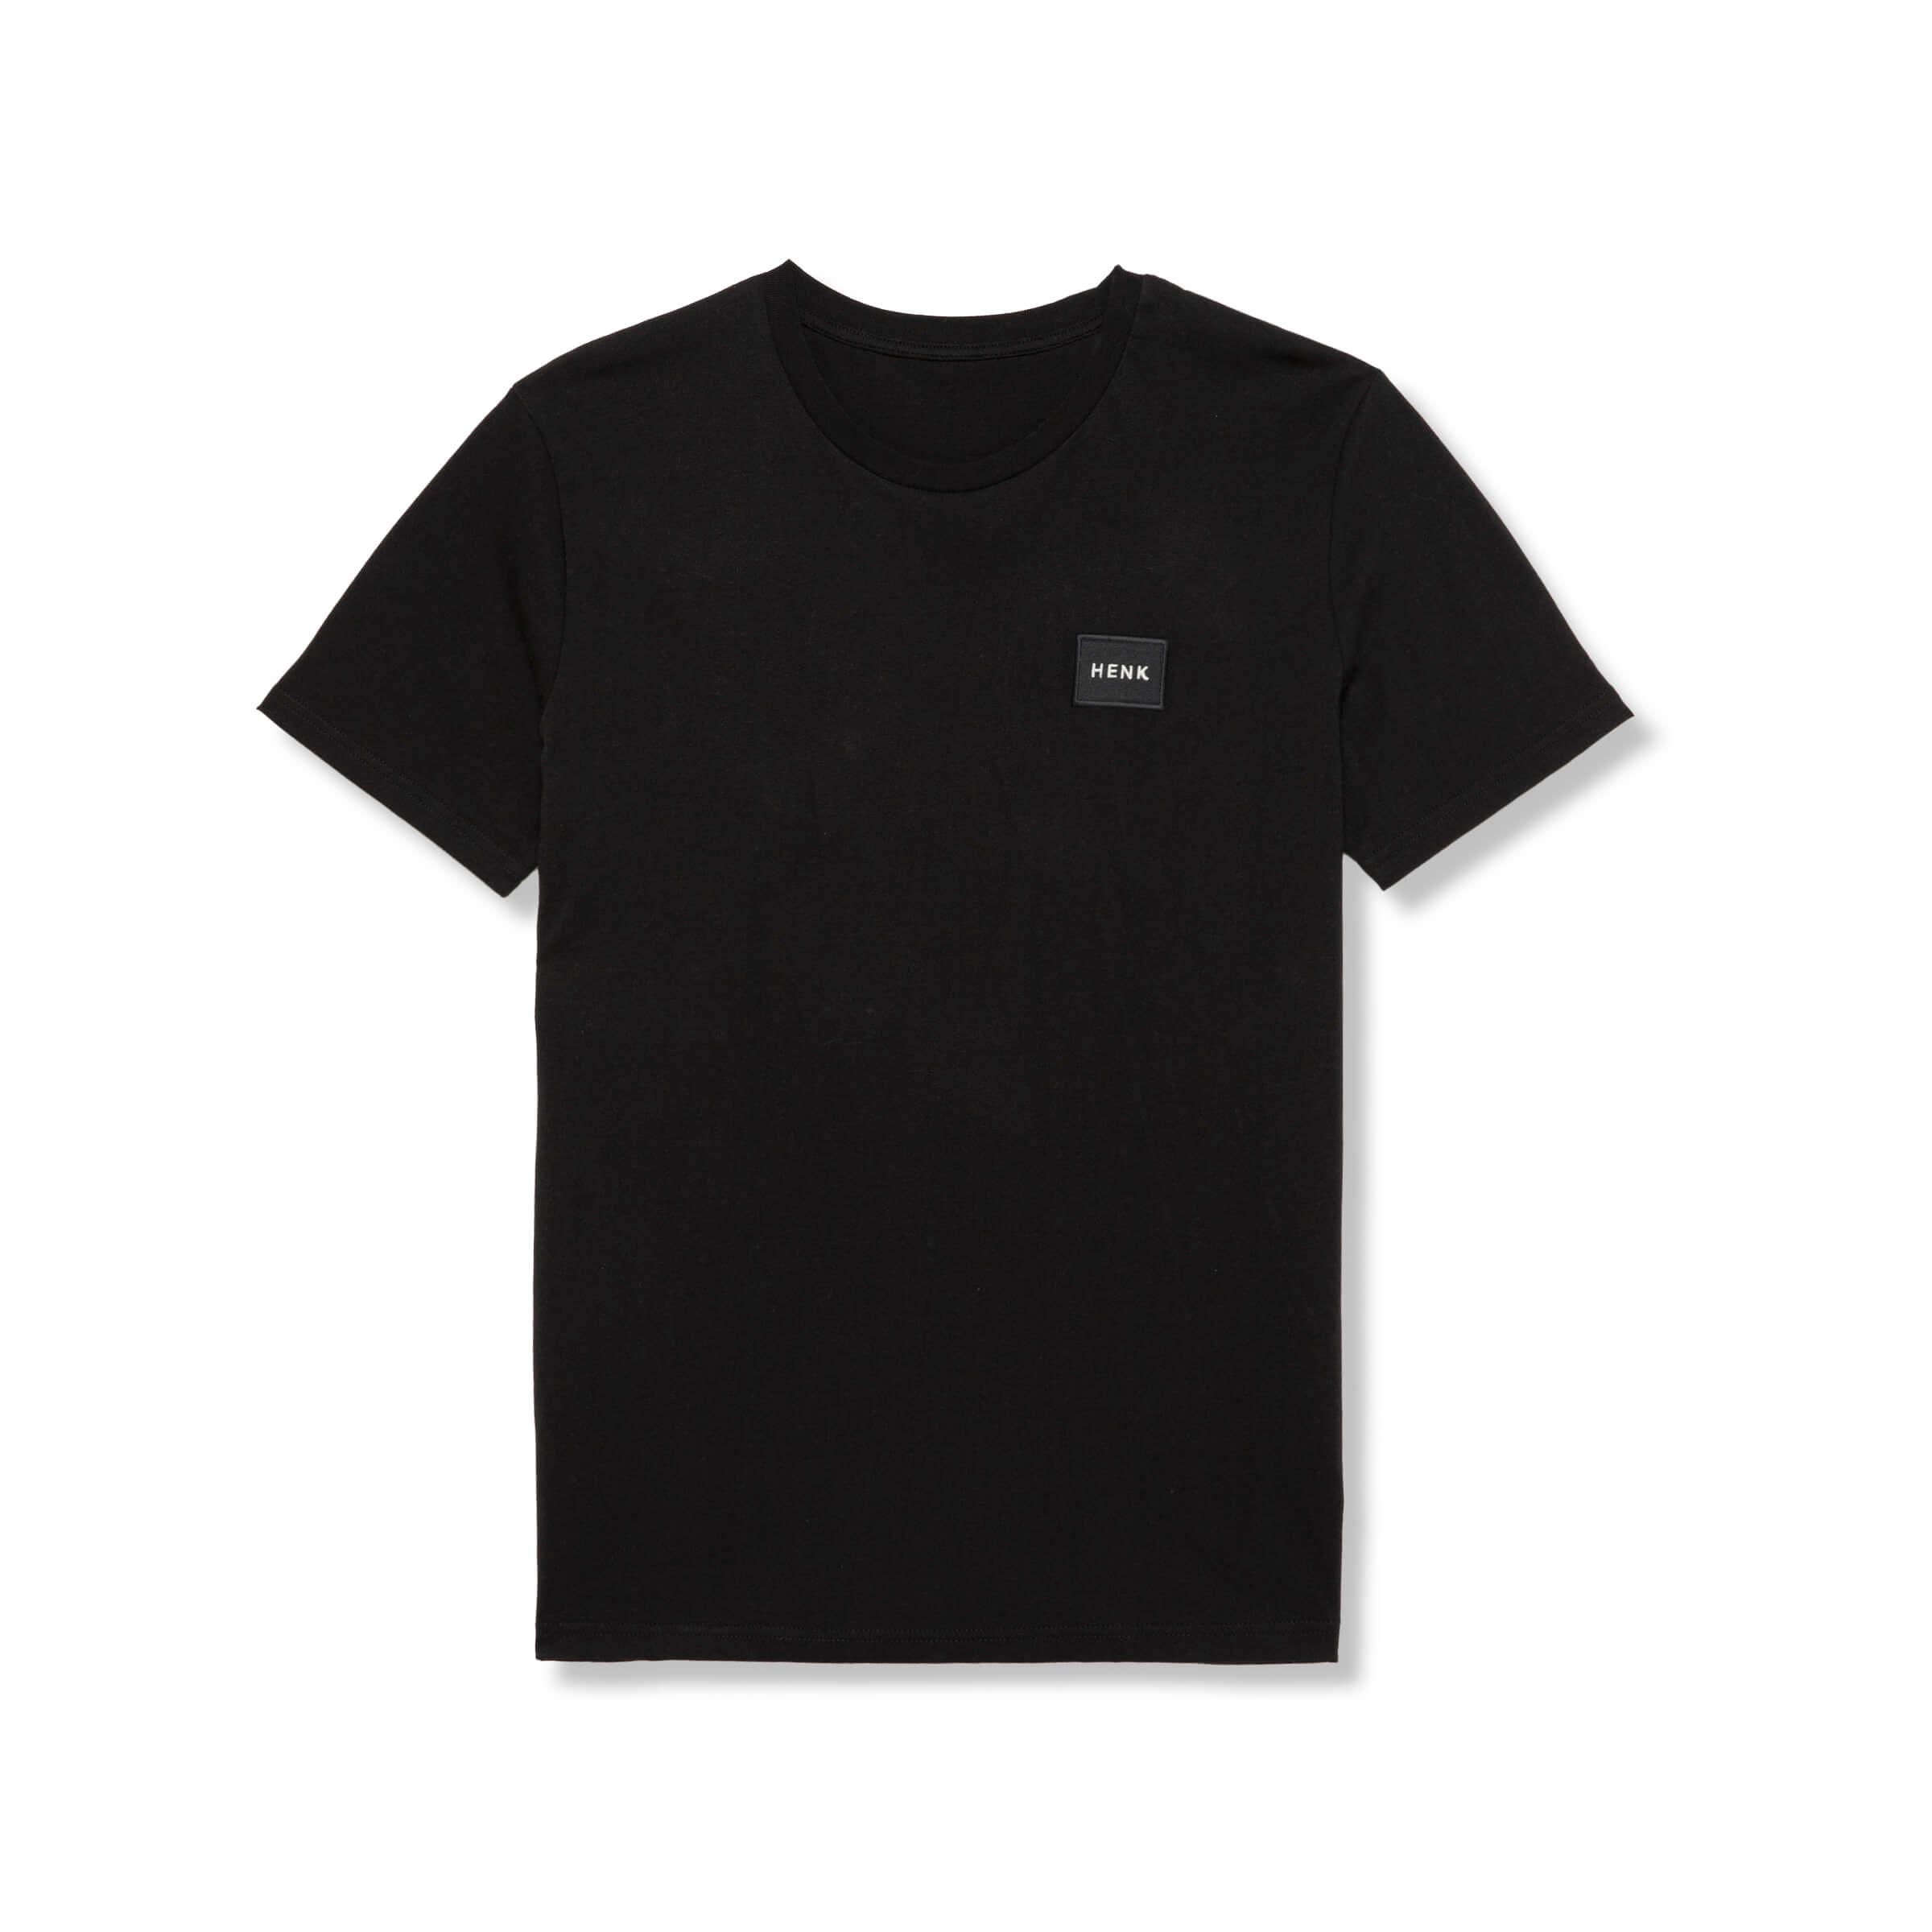 T-shirt | Black | Studio HENK | Listing_image